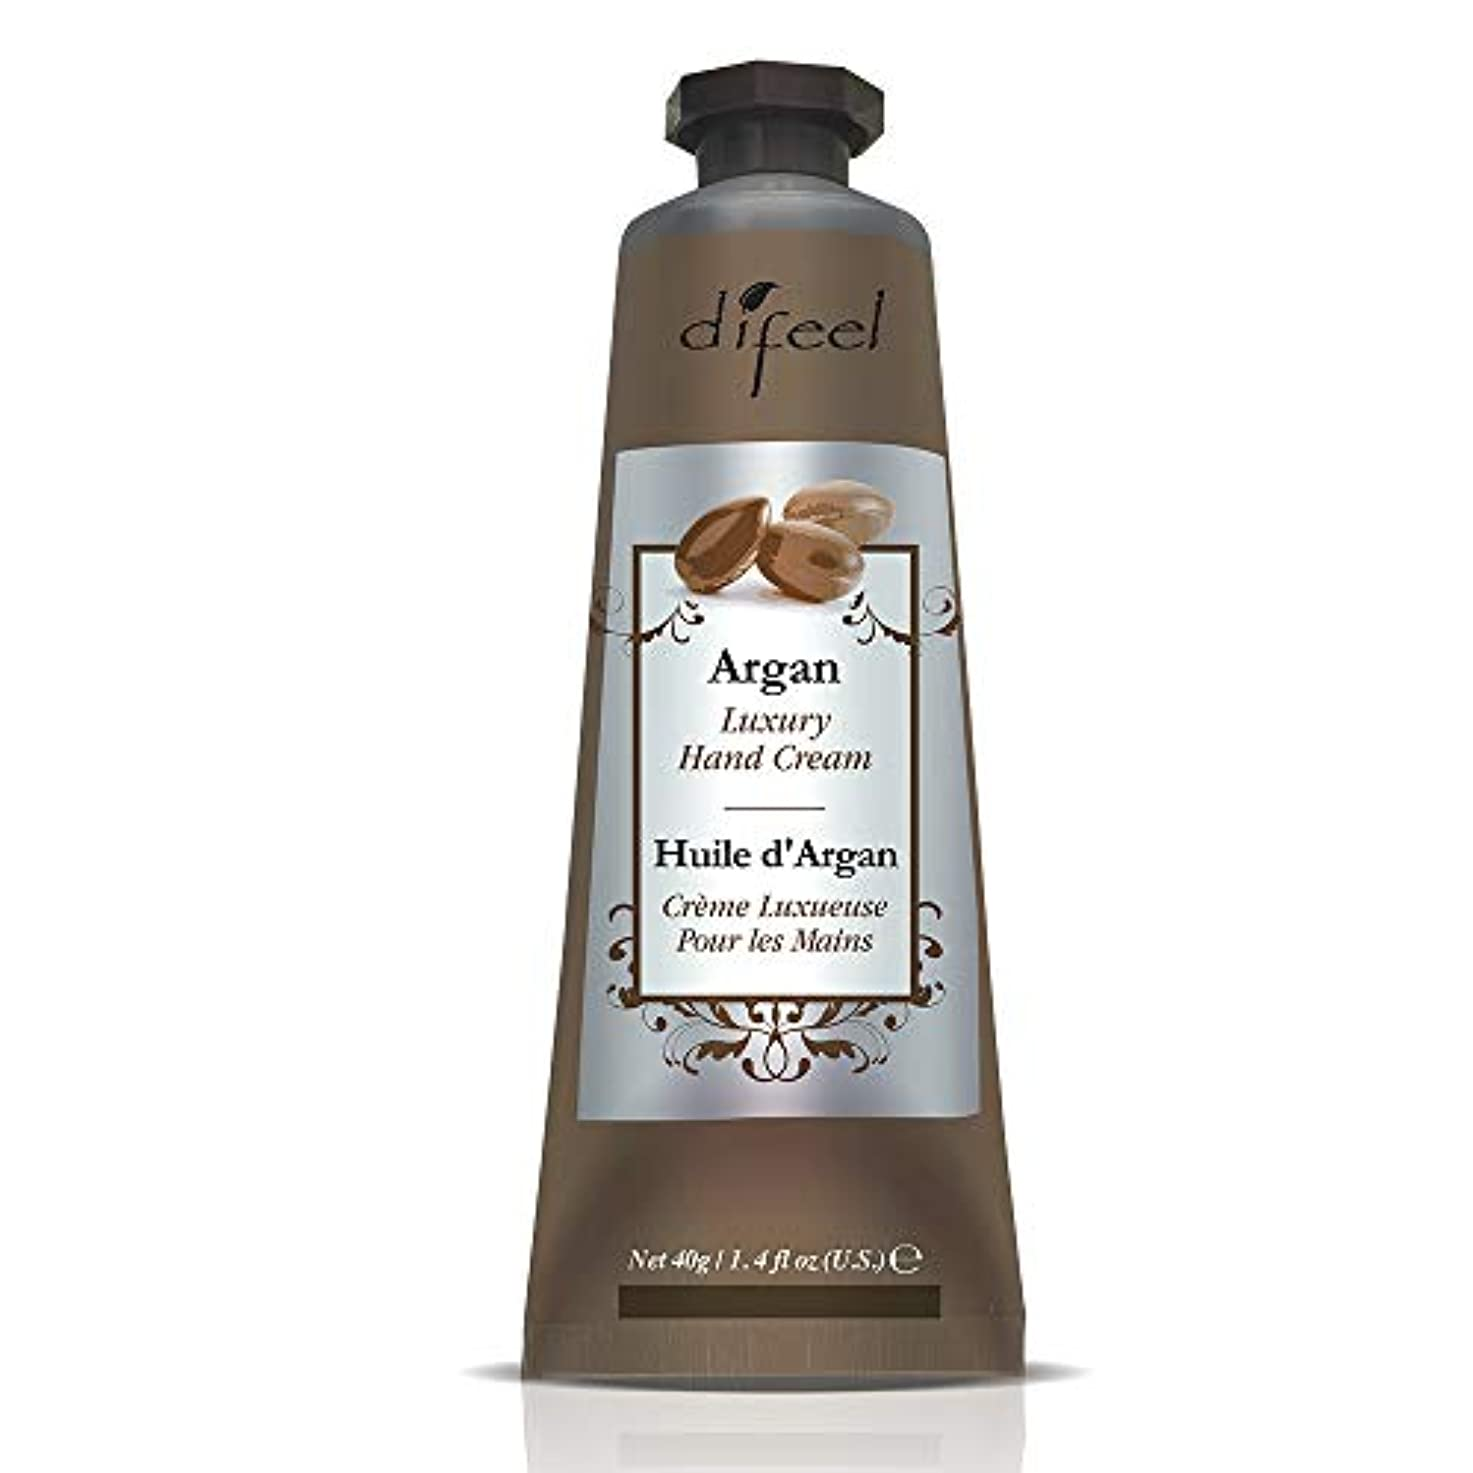 Difeel(ディフィール) アルガン ナチュラル ハンドクリーム 40g ARGAN 12ARG New York 【正規輸入品】